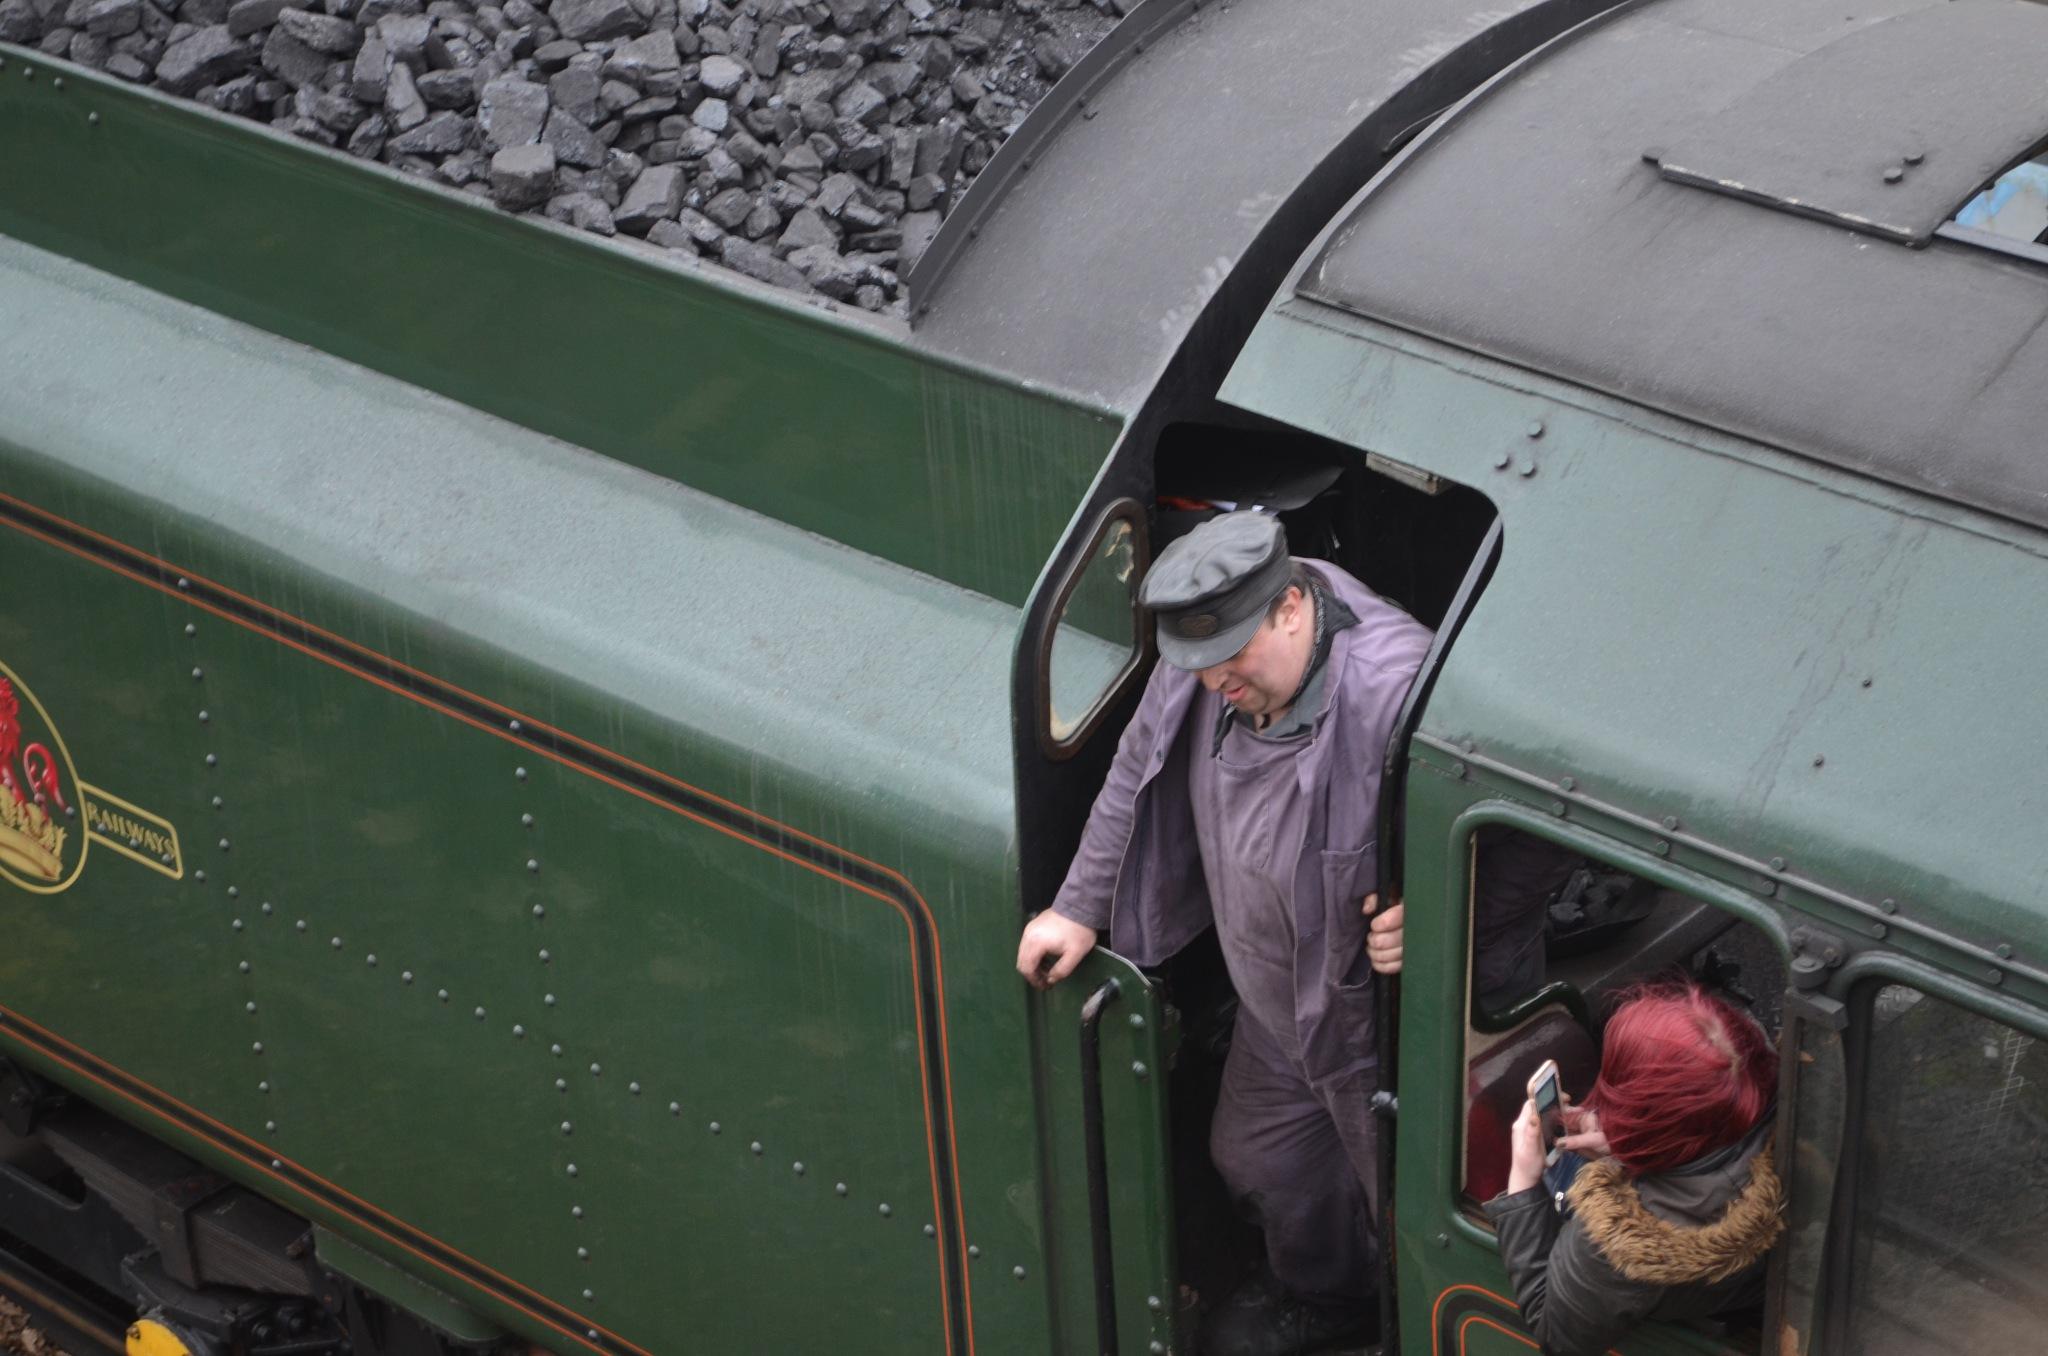 TRAIN CREW by adrian.williams.58323